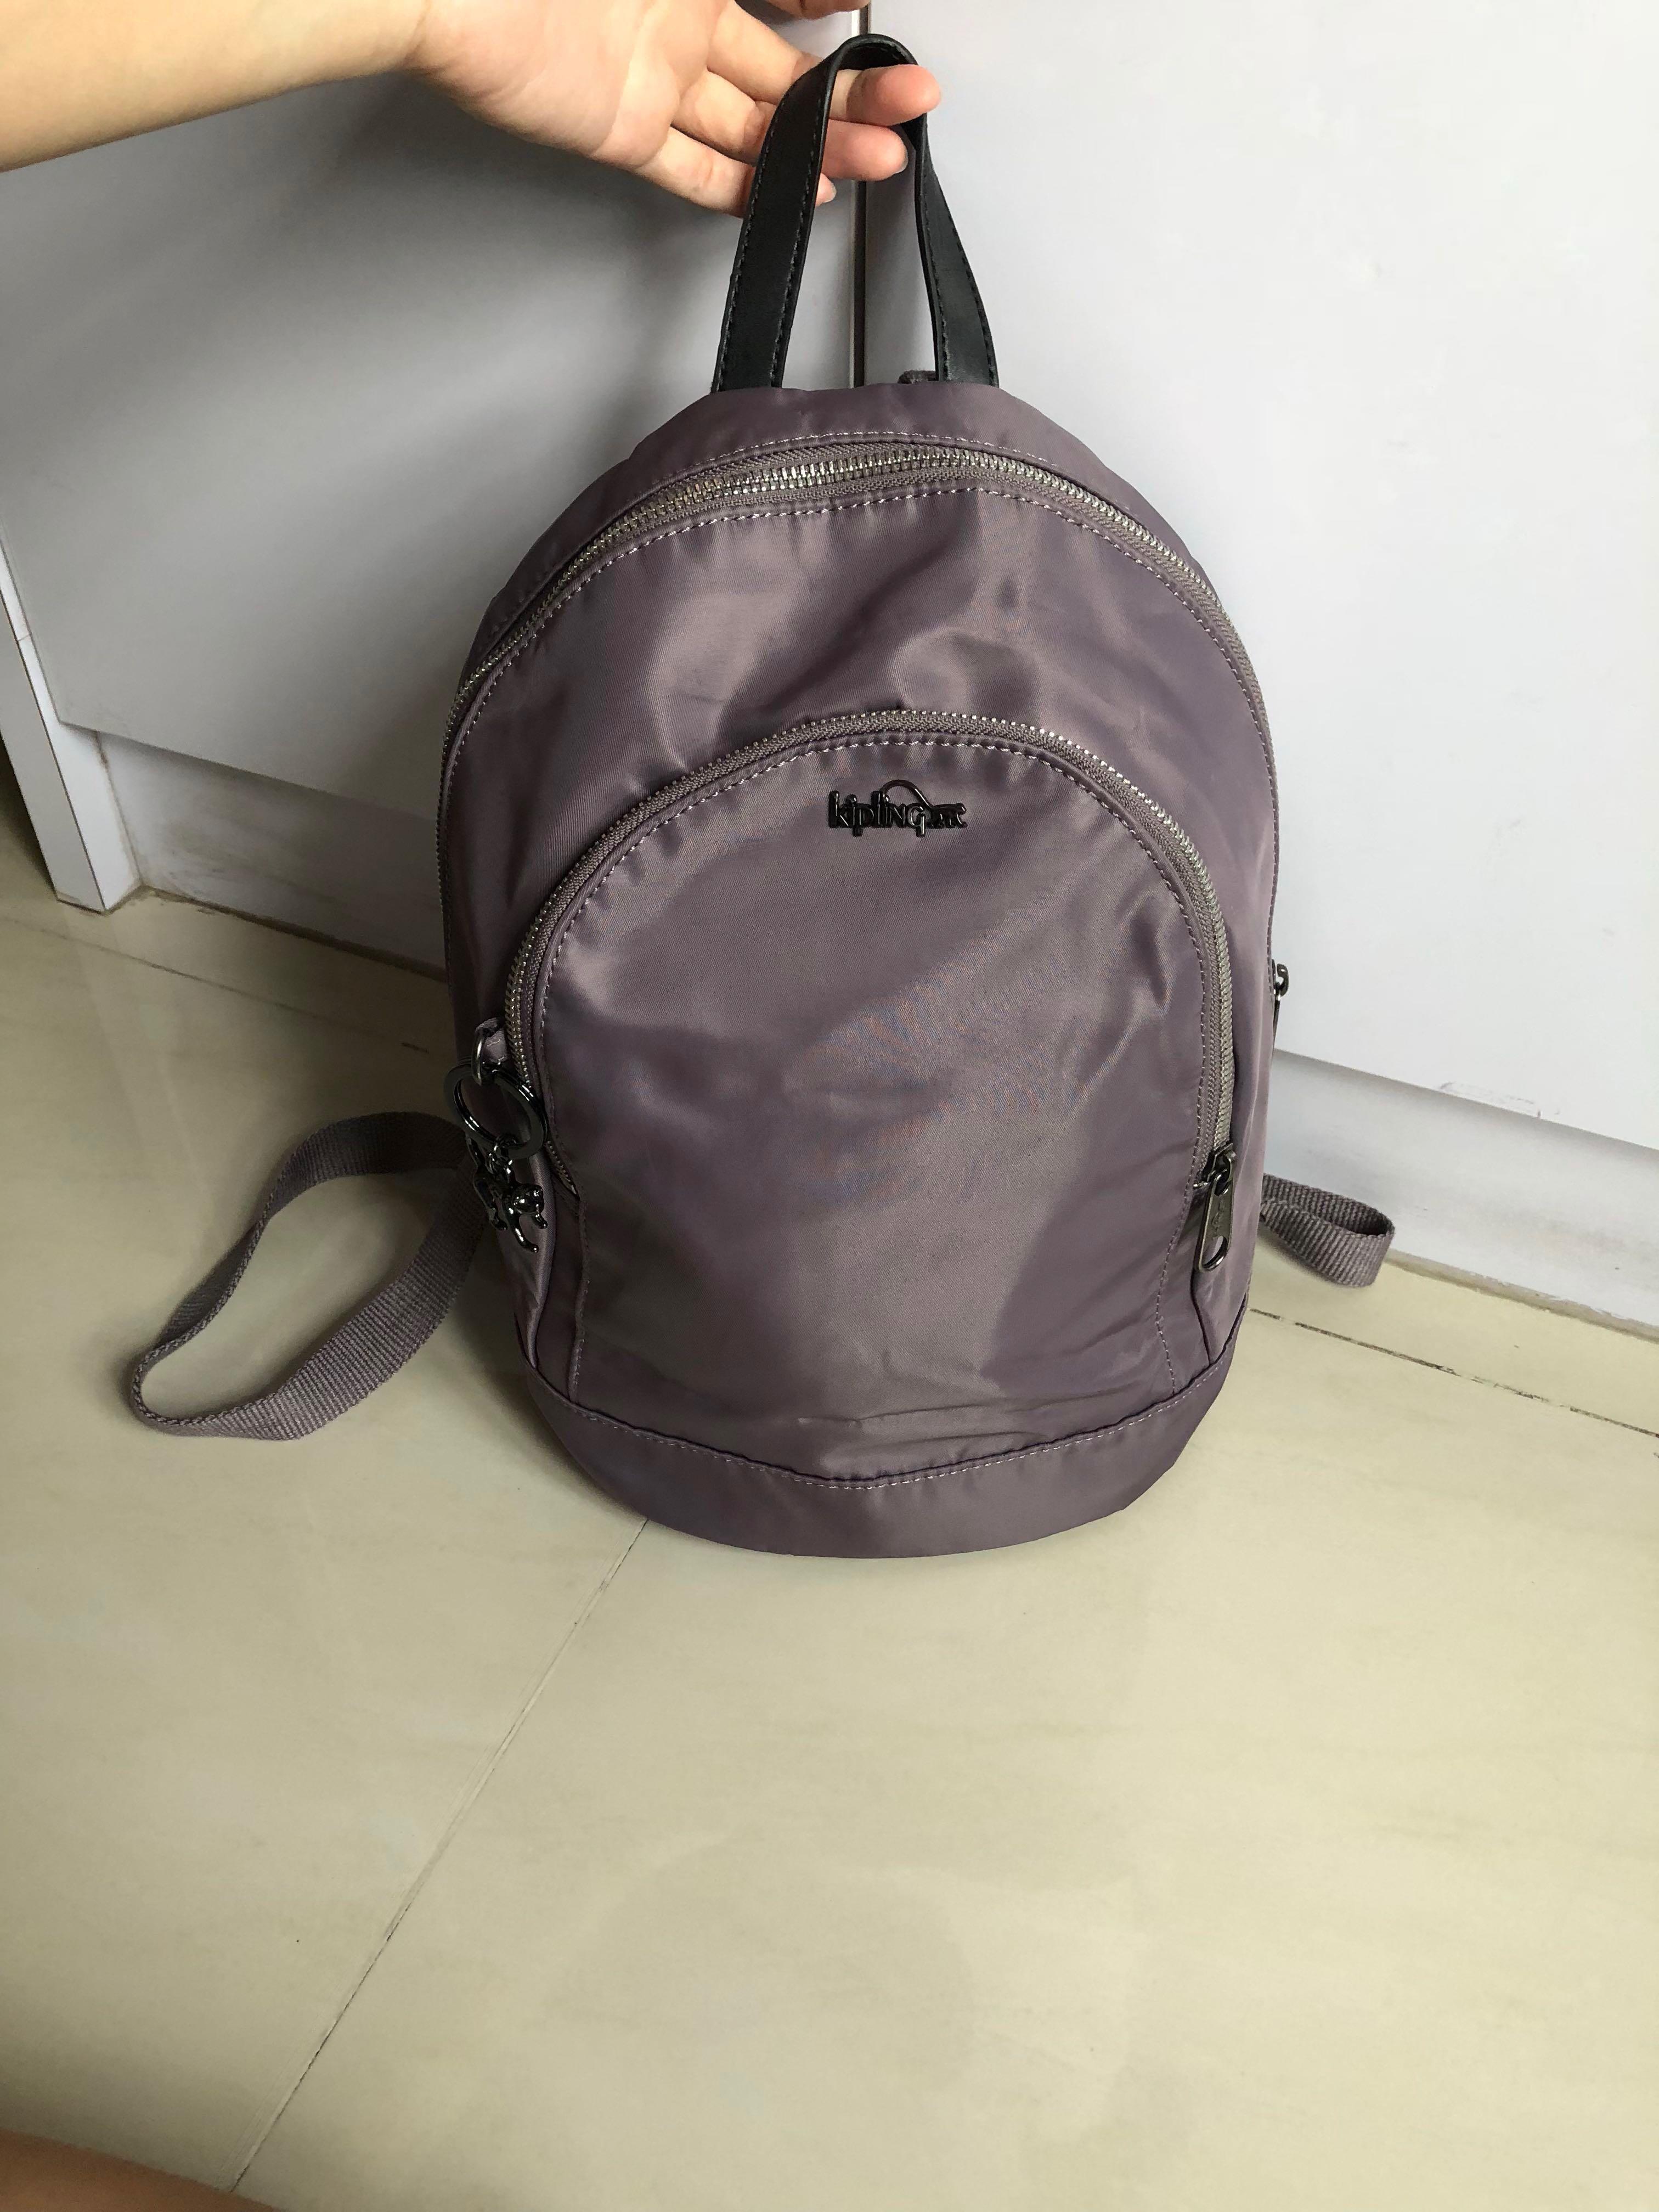 Kipling Yaretzi backpack (Smooth Nylon) afb05a57b0